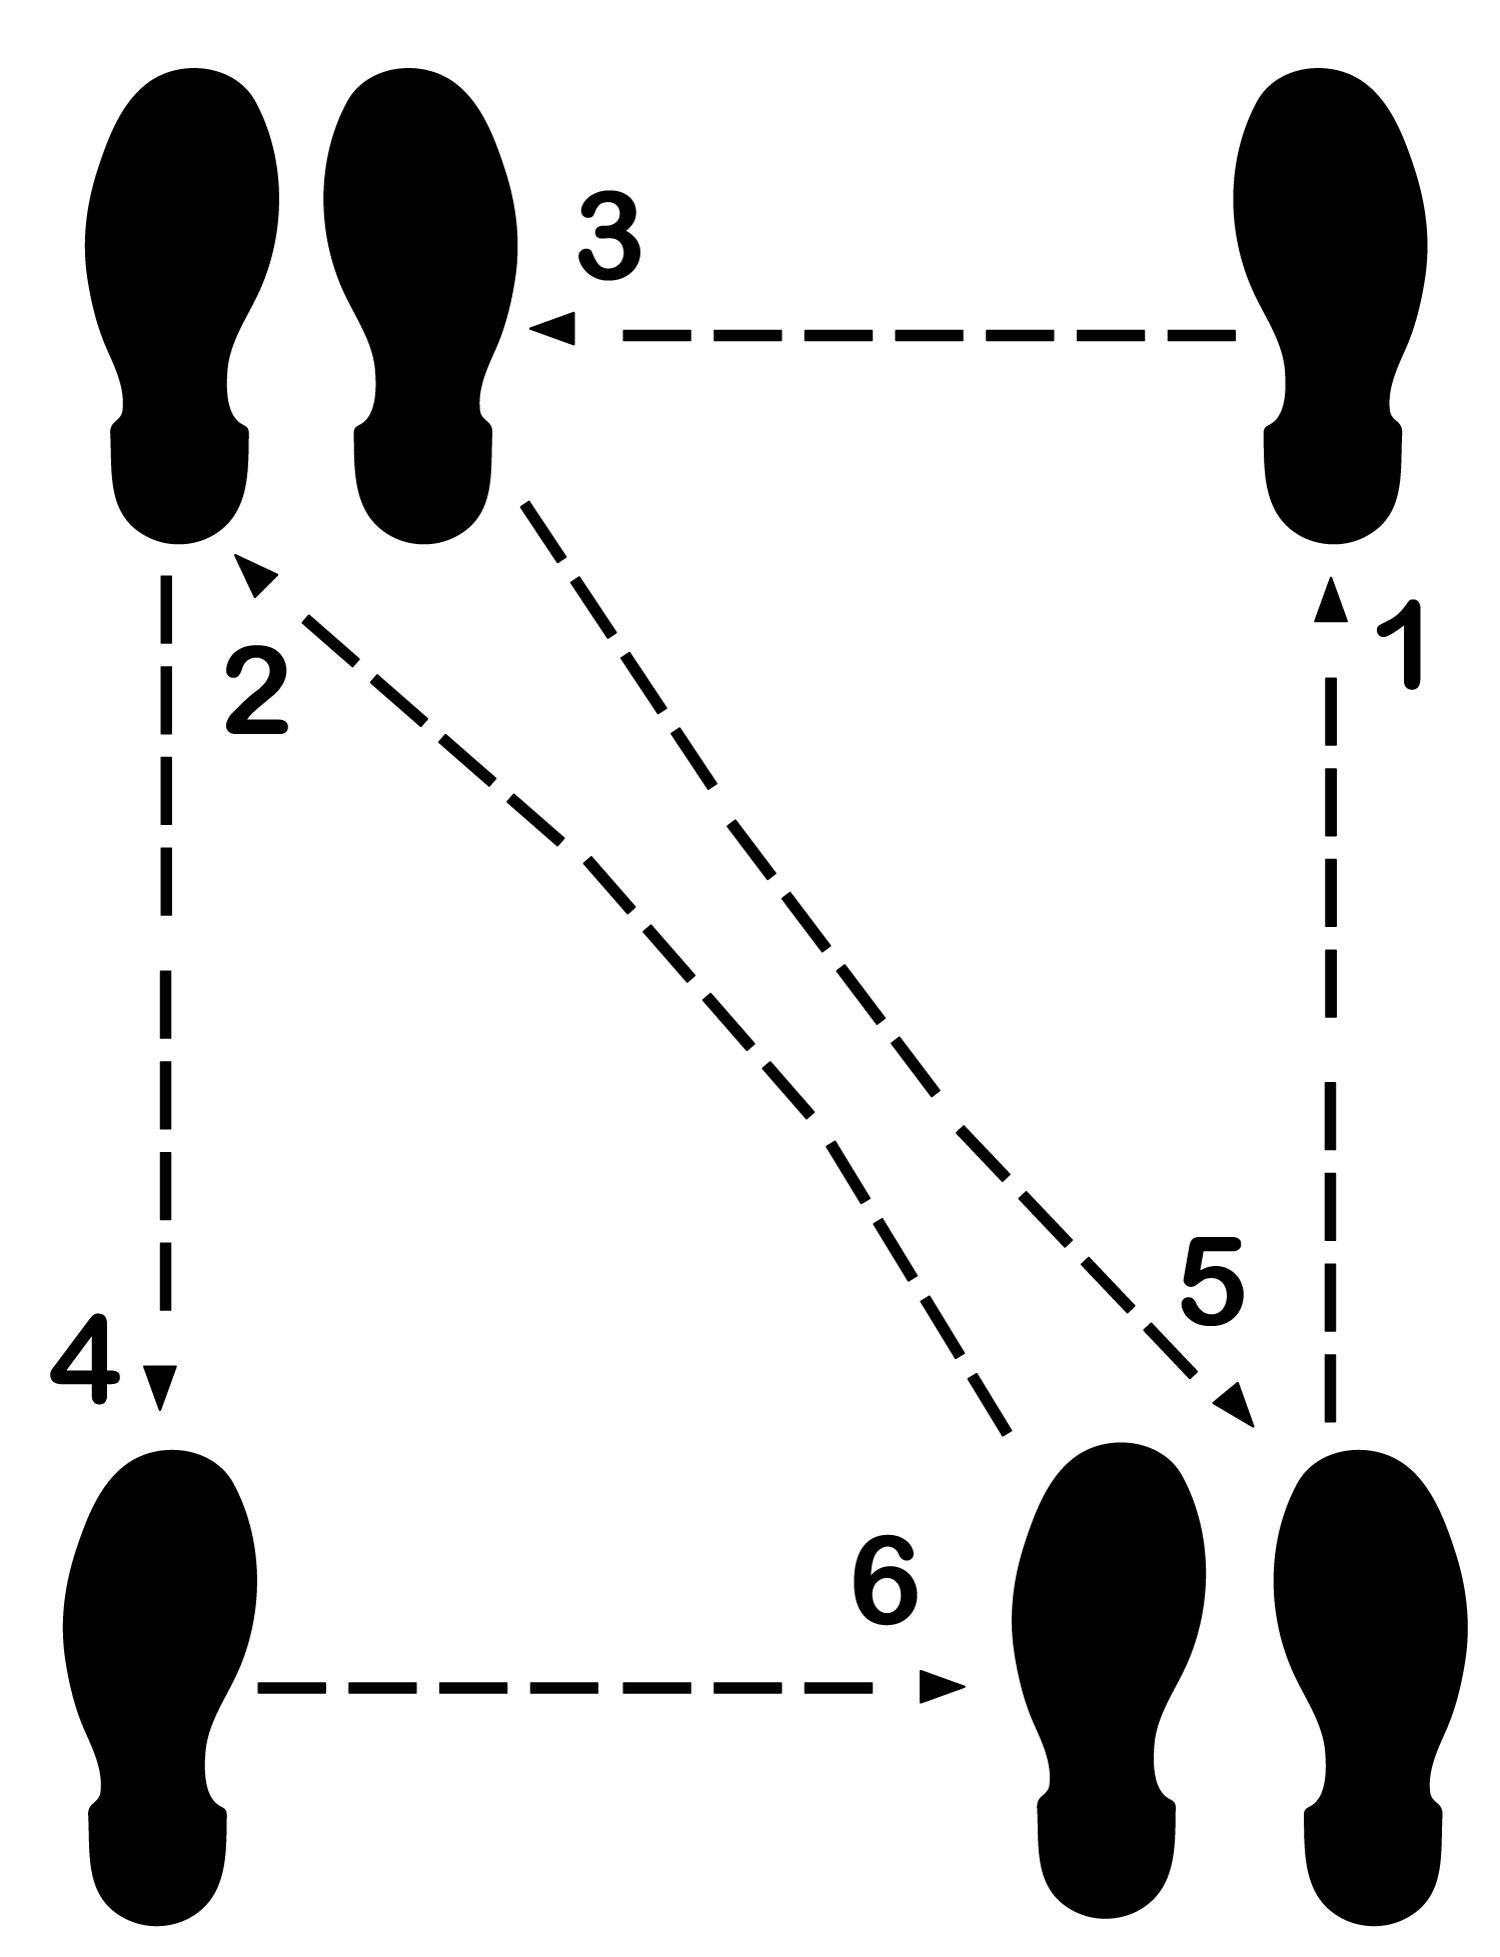 Litemark Durable Dance Floor Diagram Decal 8 Step Kit